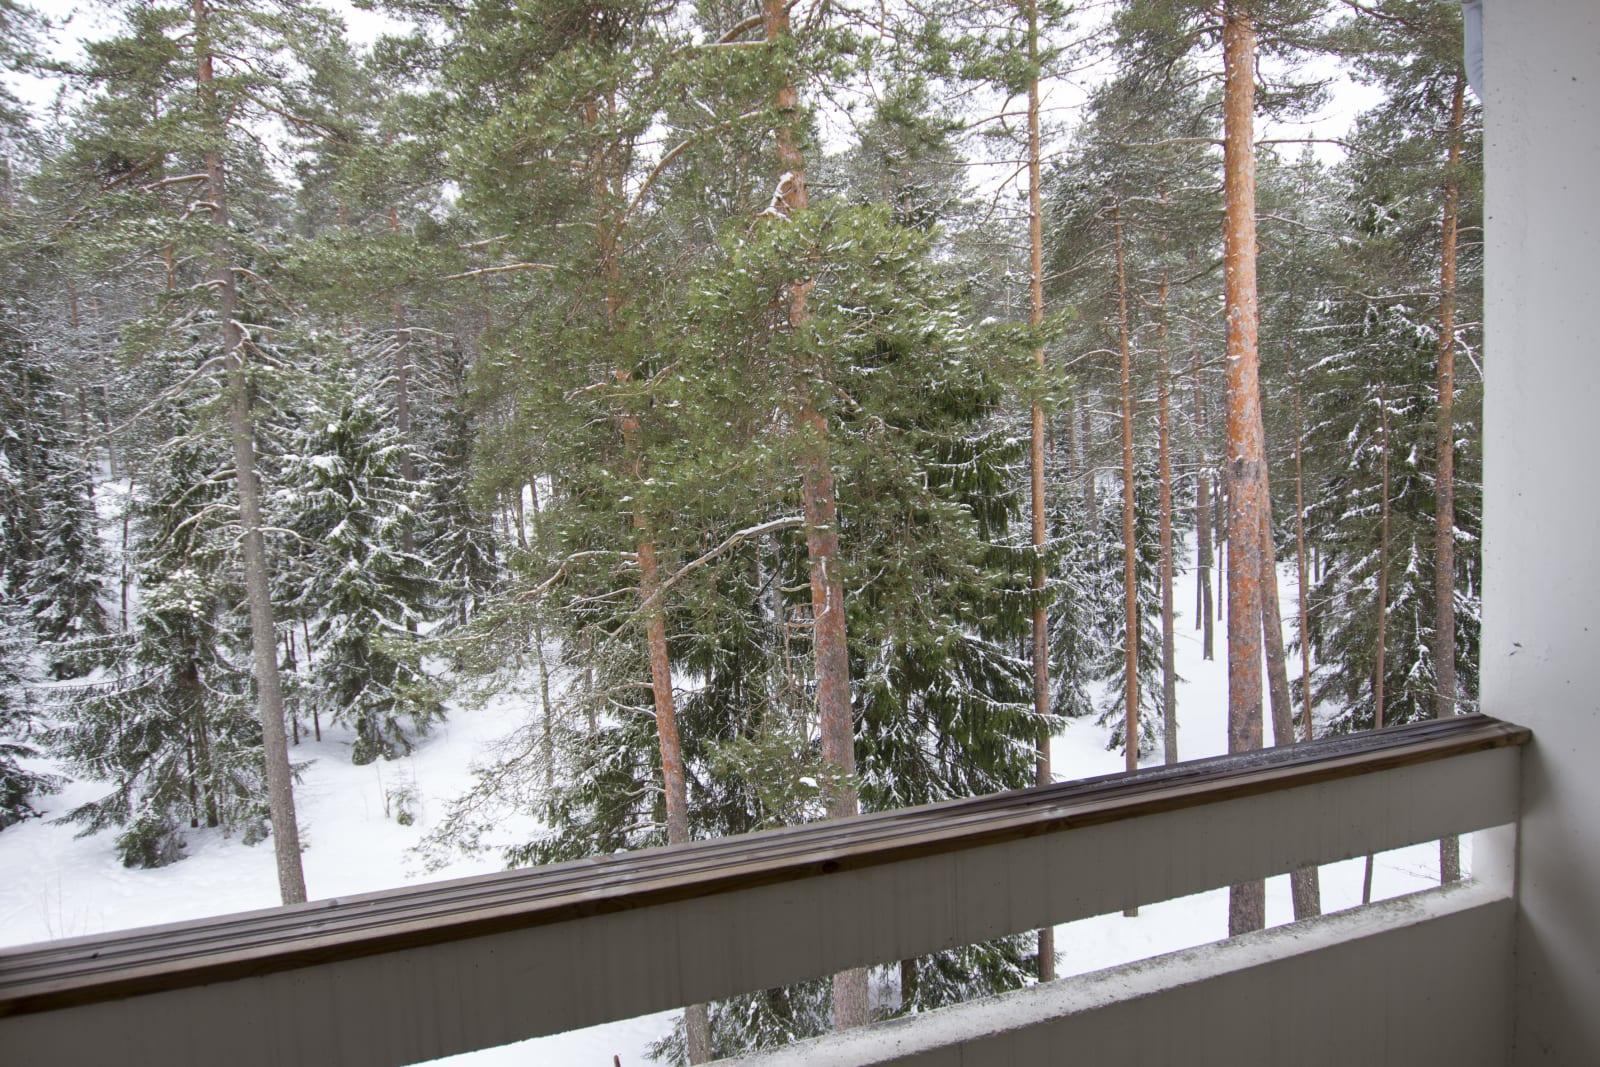 Ylöjärvi, Soppeenmäki, Murtomäentie 4-6